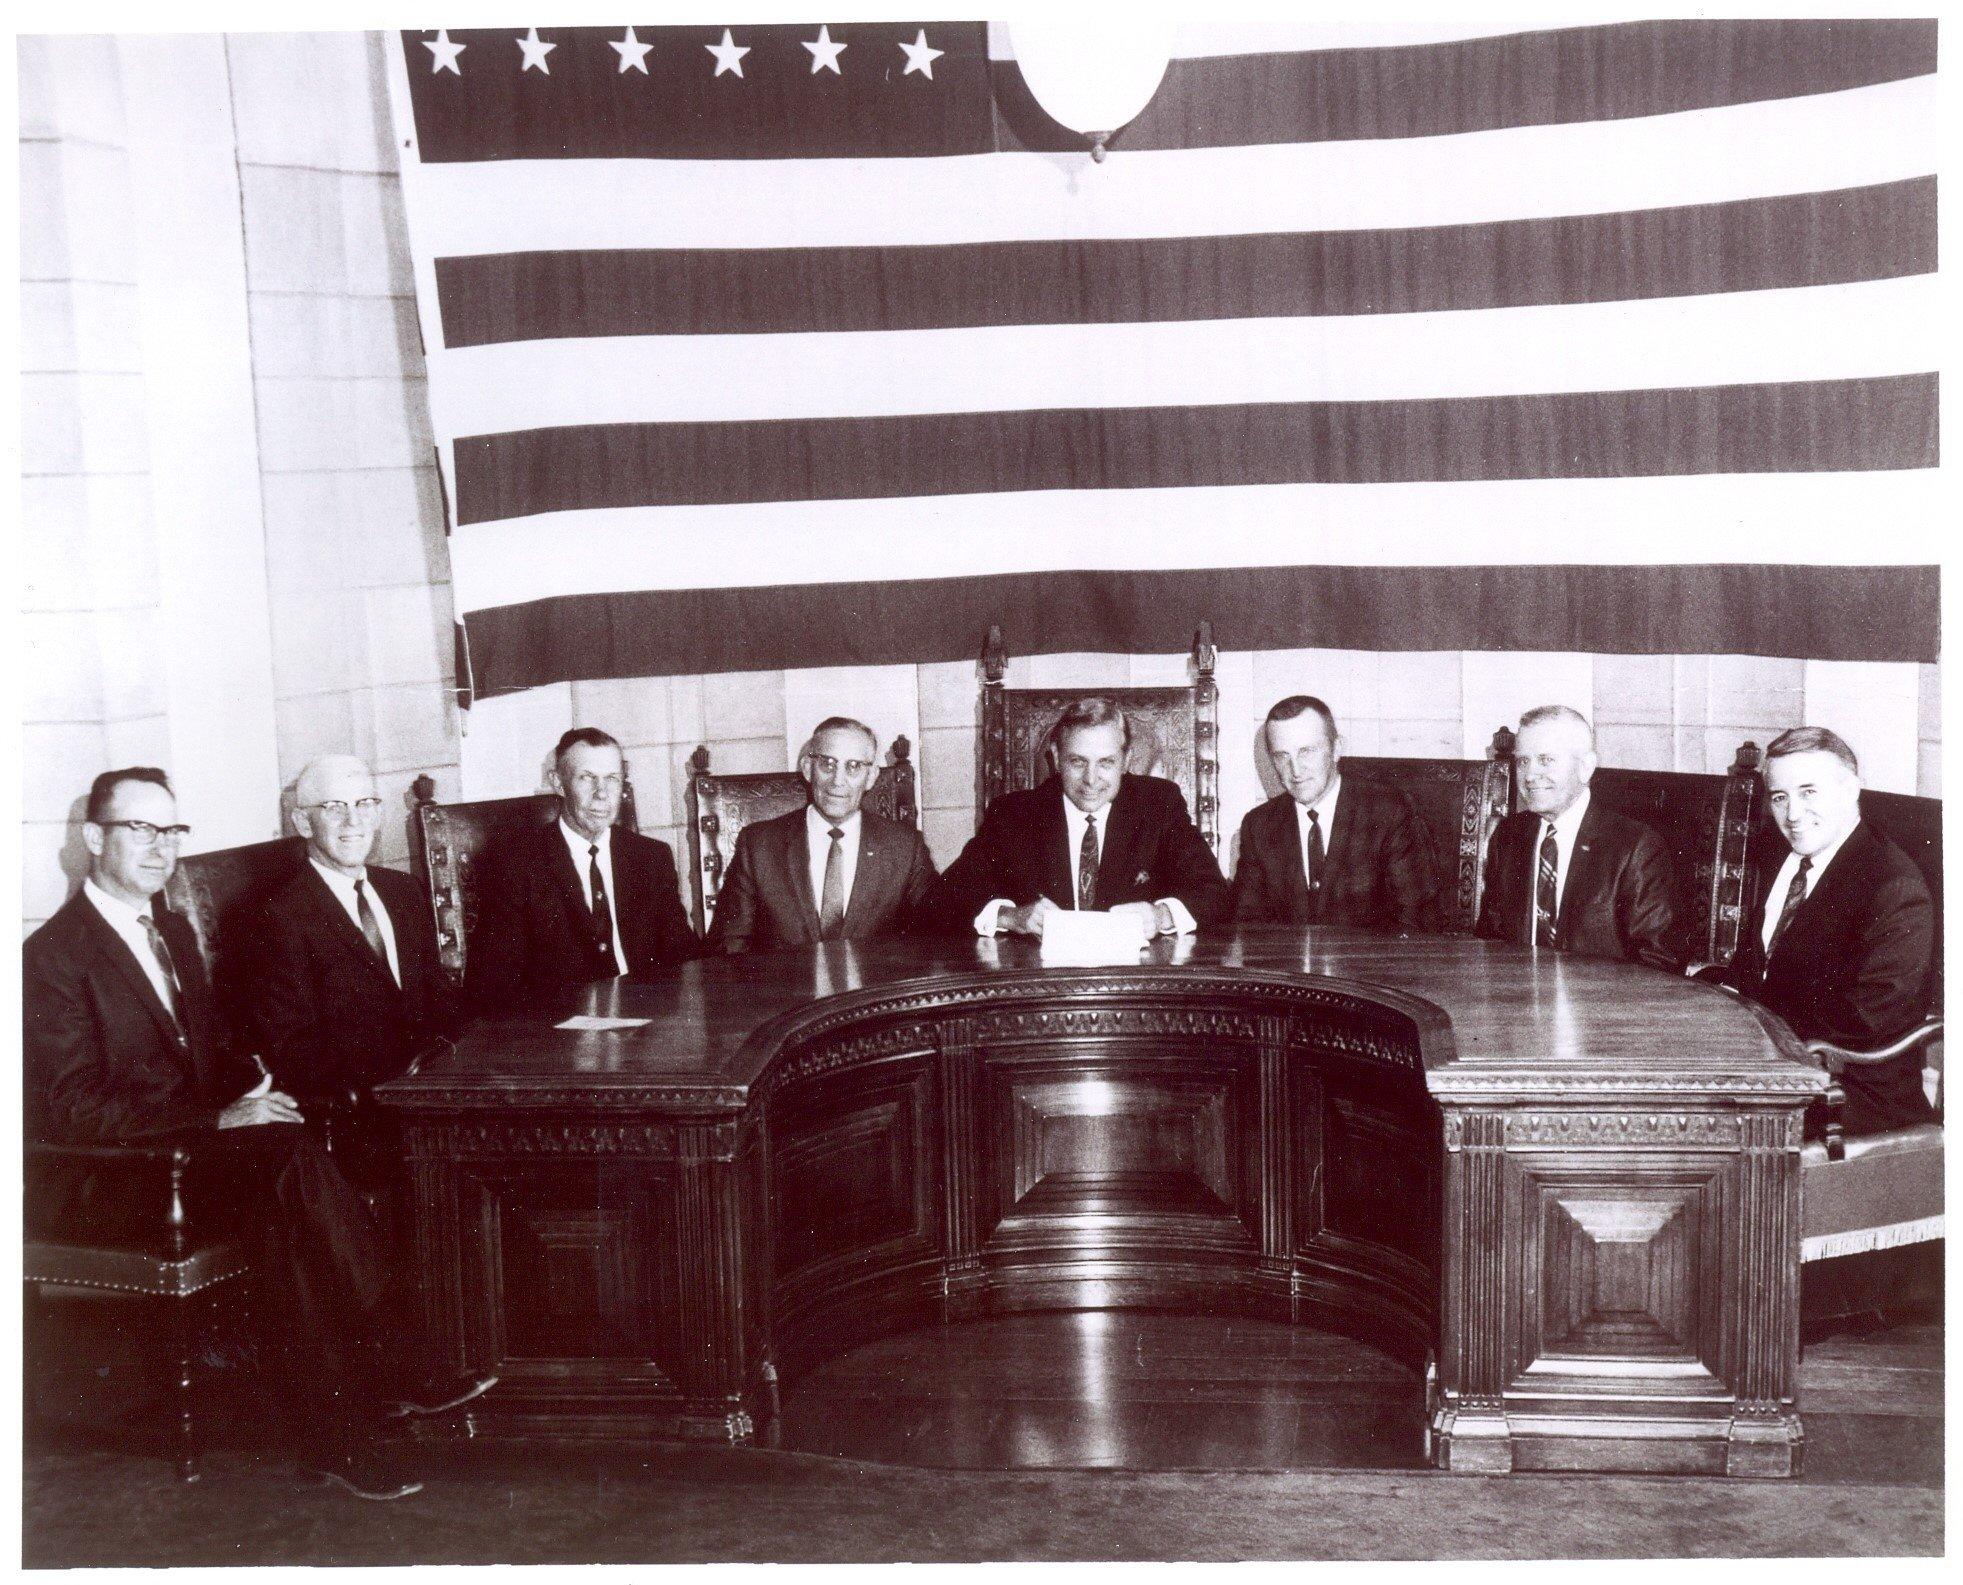 From left:  Harold Siek, Herman Link, Chet Ellis, Senator Maurice Kremer, Governor Tiemann, Warren Patefield, Milton Fricke, and Warren Fairchild.